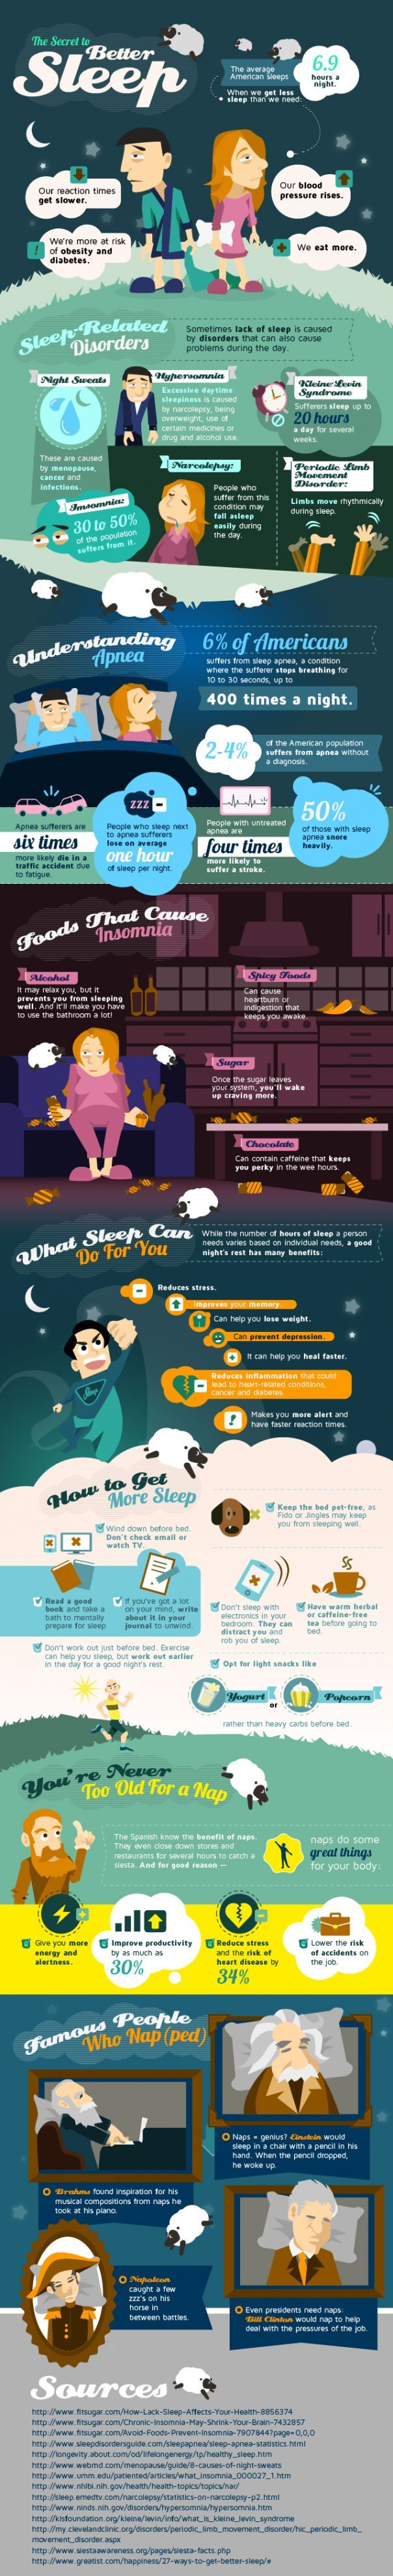 A fun breakdown on the negative effects of not getting enough sleep. #rest #sleep get better sleep, sleeping tips